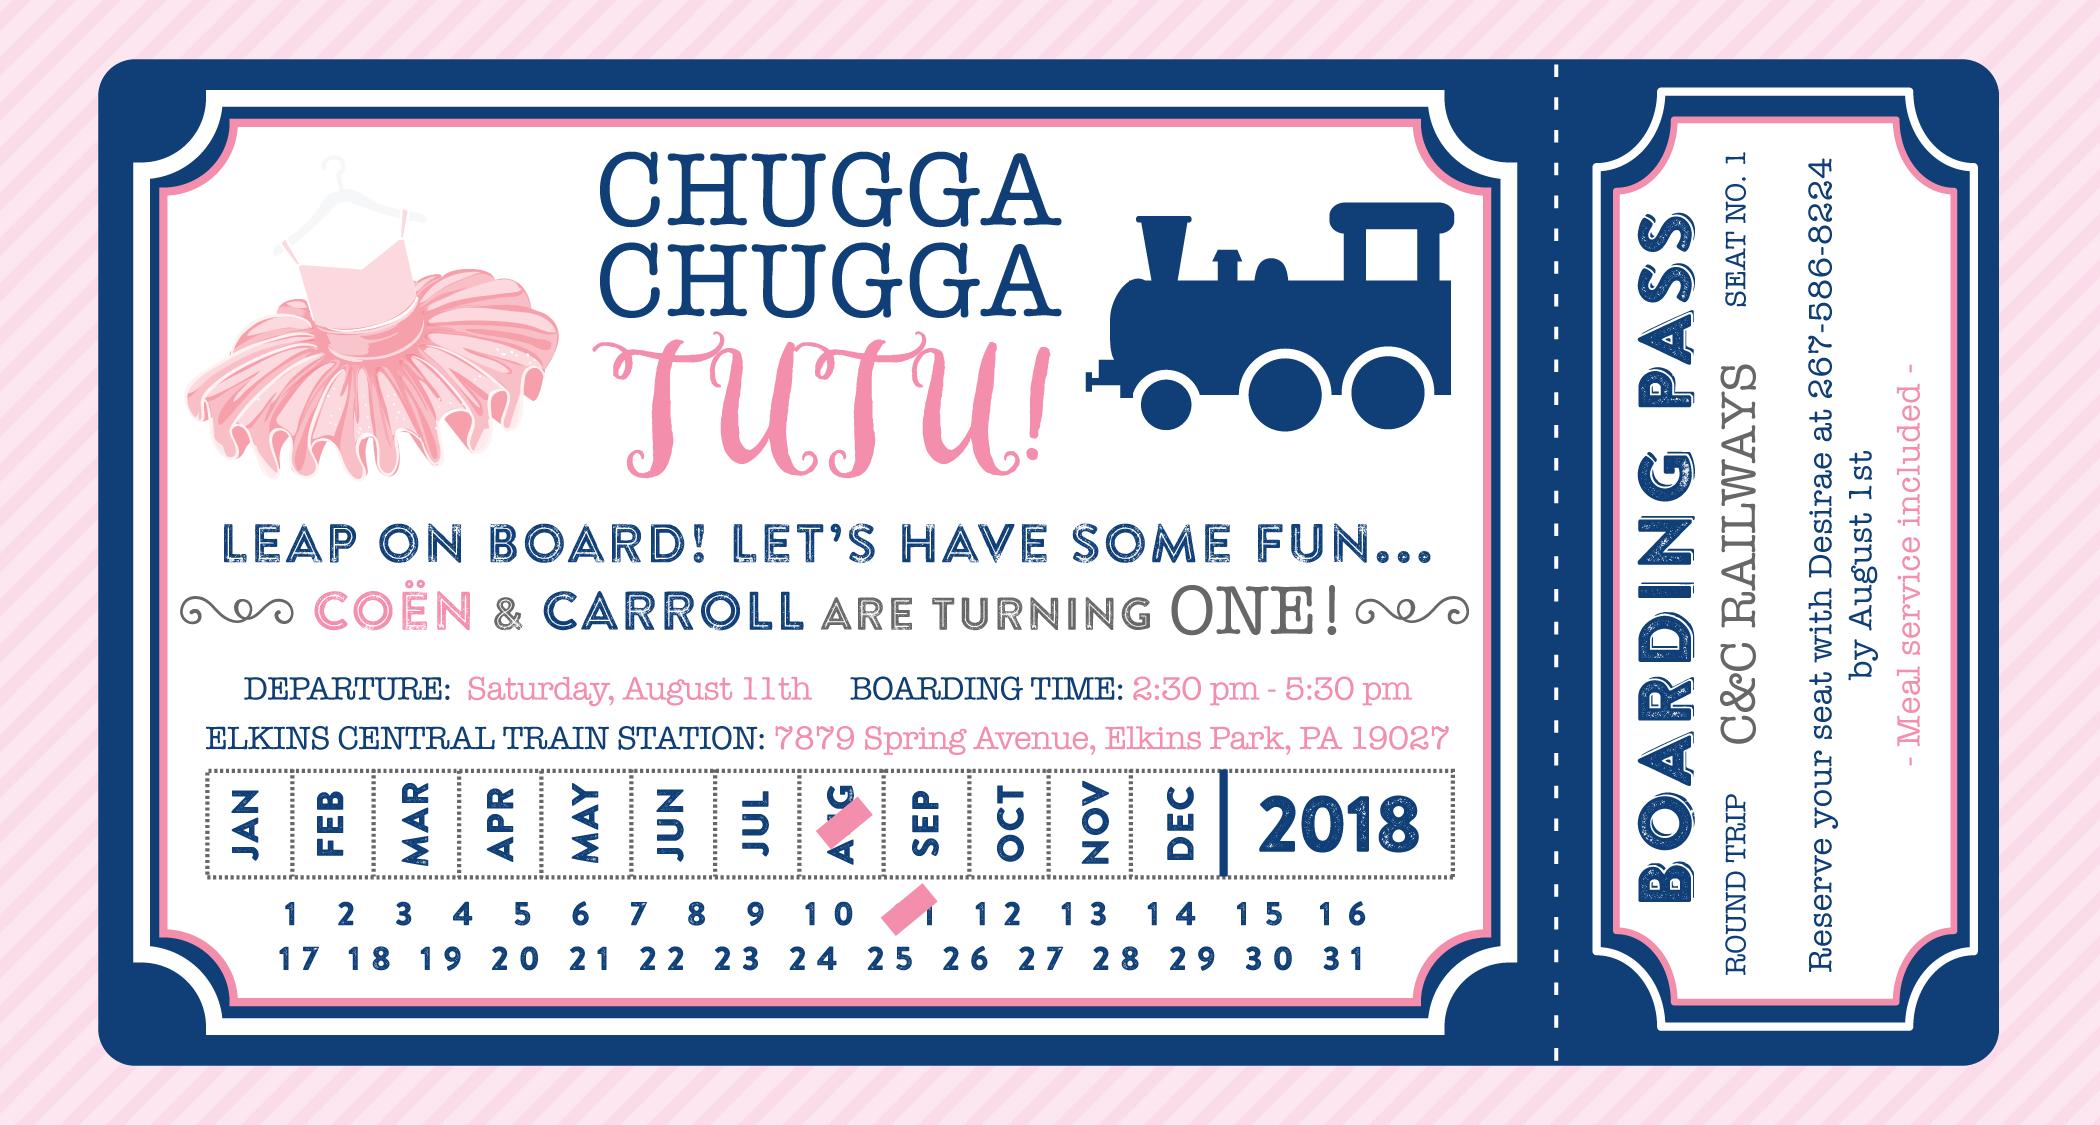 All-Aboard-Train-Ticket-TUTU-Boy-Girl-Twins---DesiraeE.png